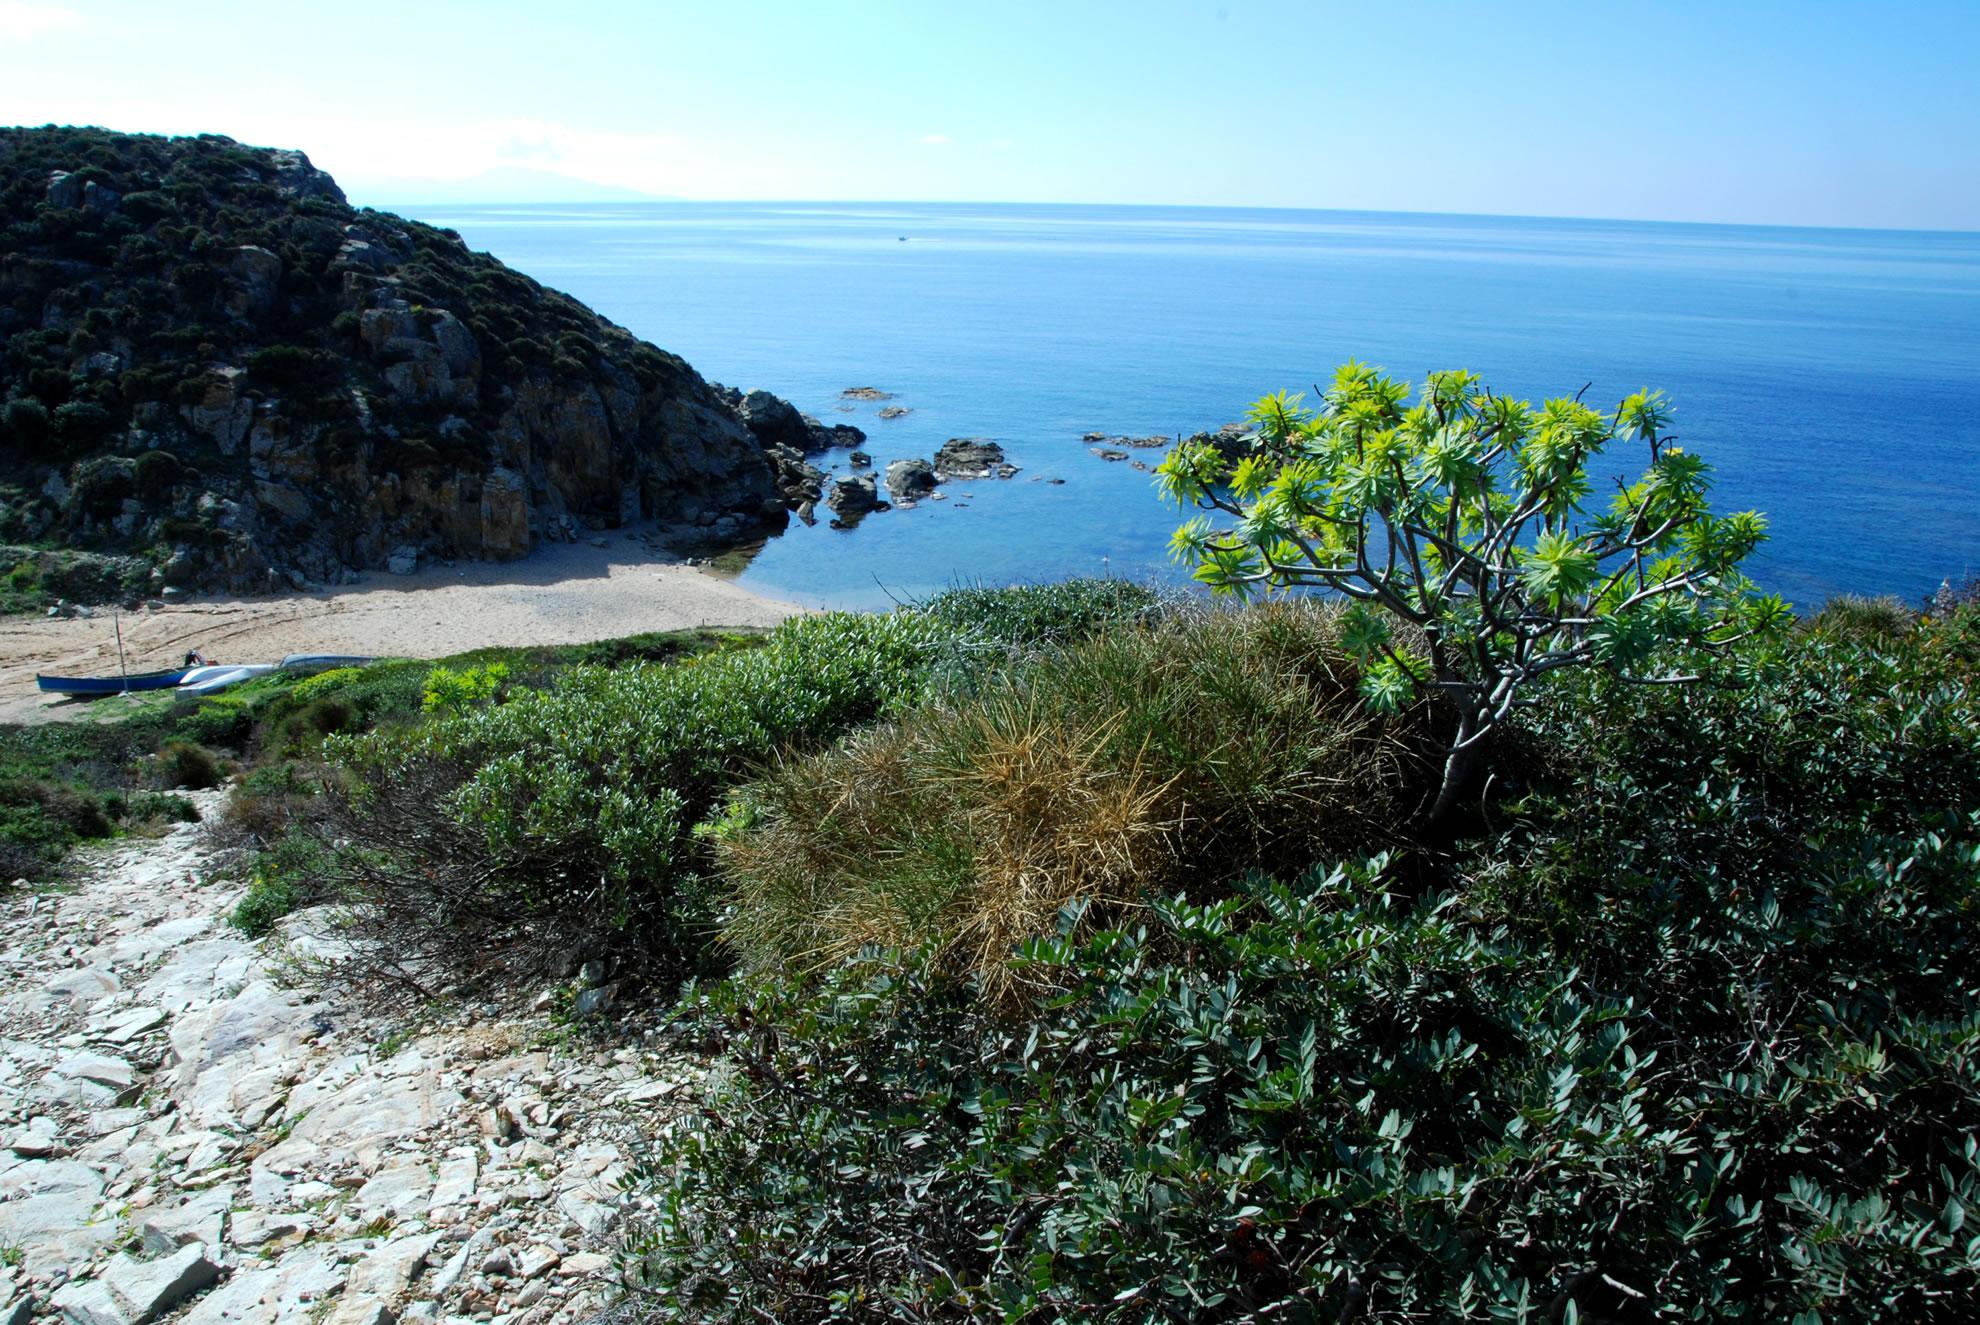 La spiaggetta di Portu Is Cannisonis